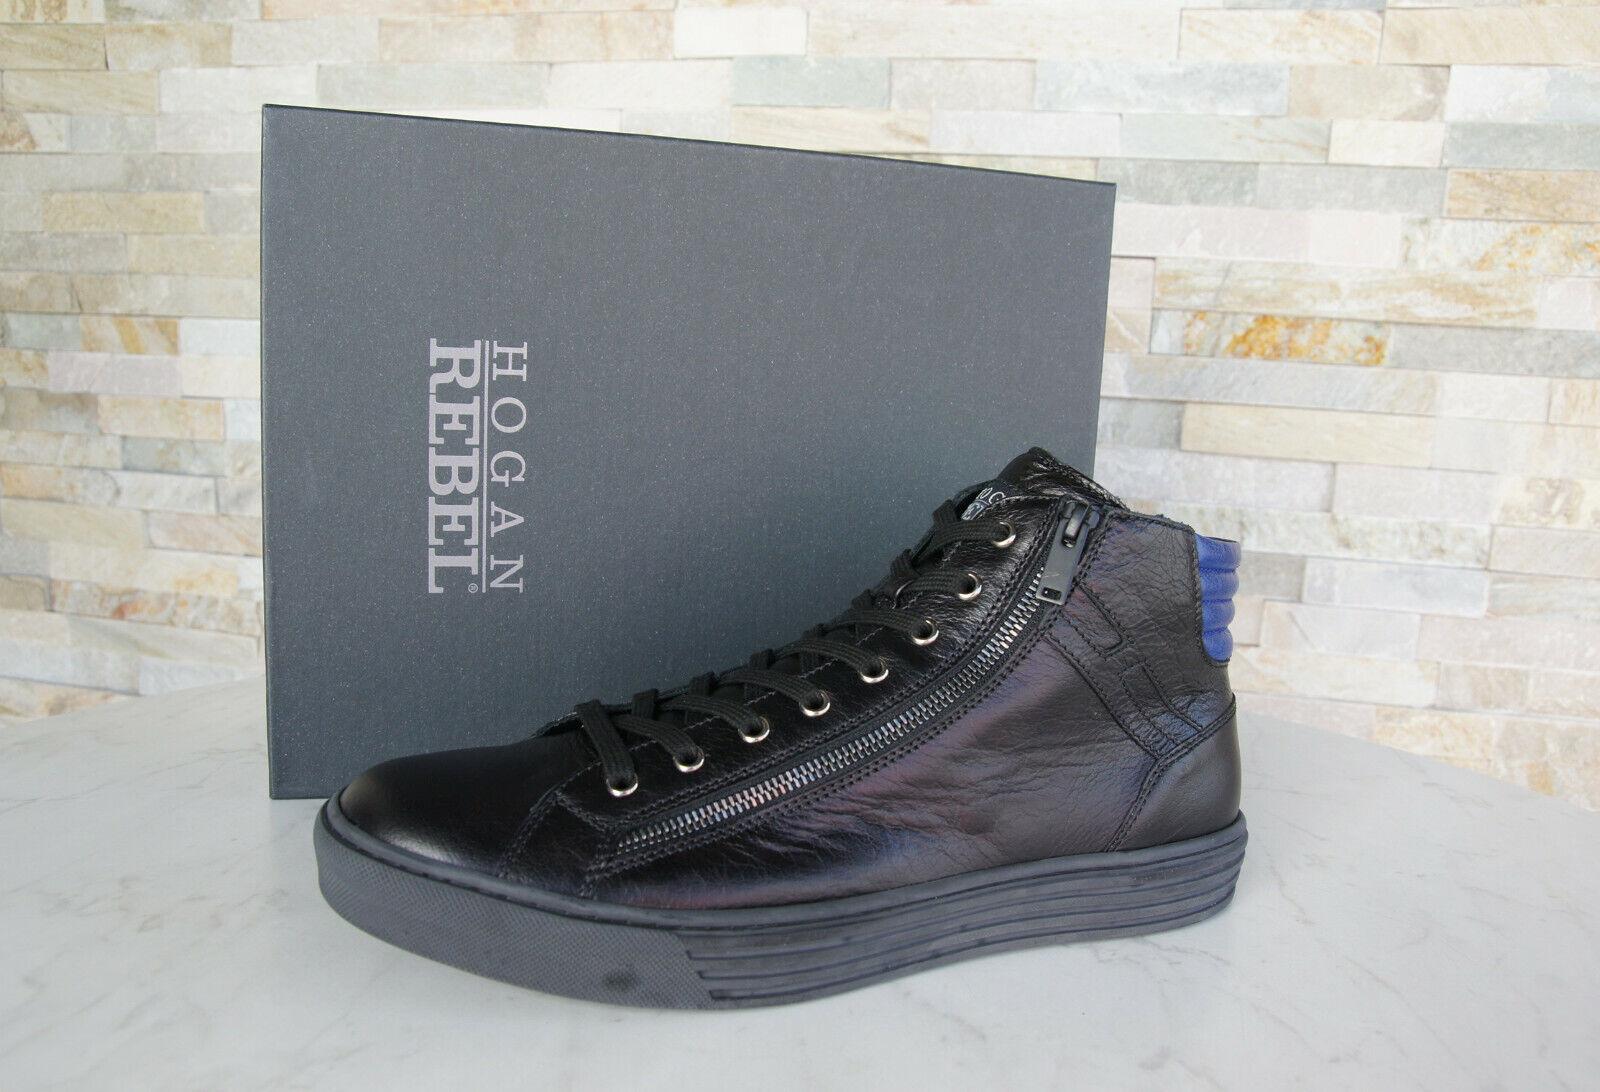 Hogan 11 45 High Top zapatillas schnürzapatos nuevo zapatos negro azul ex. PVP